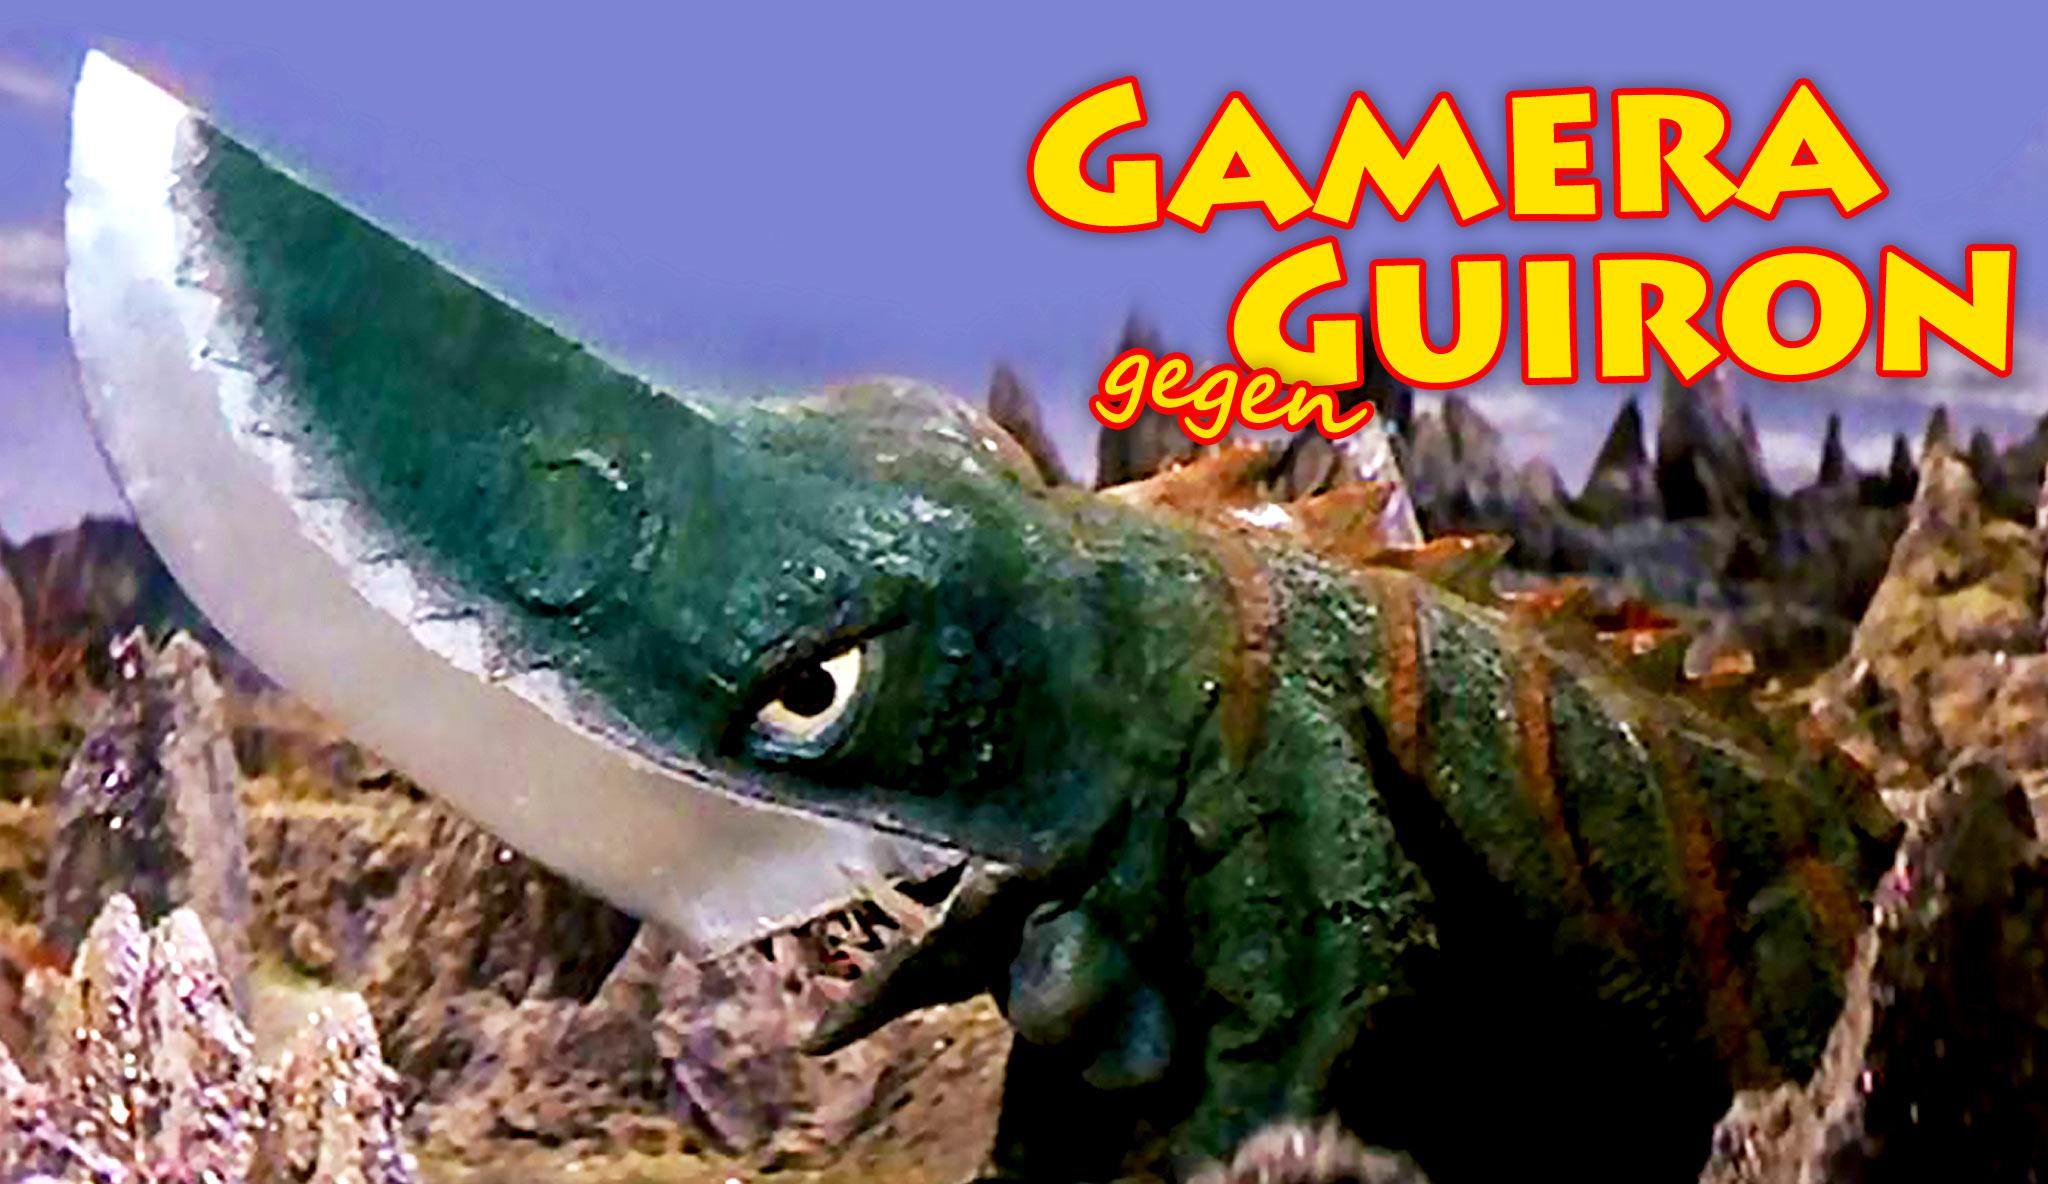 gamera-gegen-guiron-frankensteins-monsterkampf-im-weltall\header.jpg